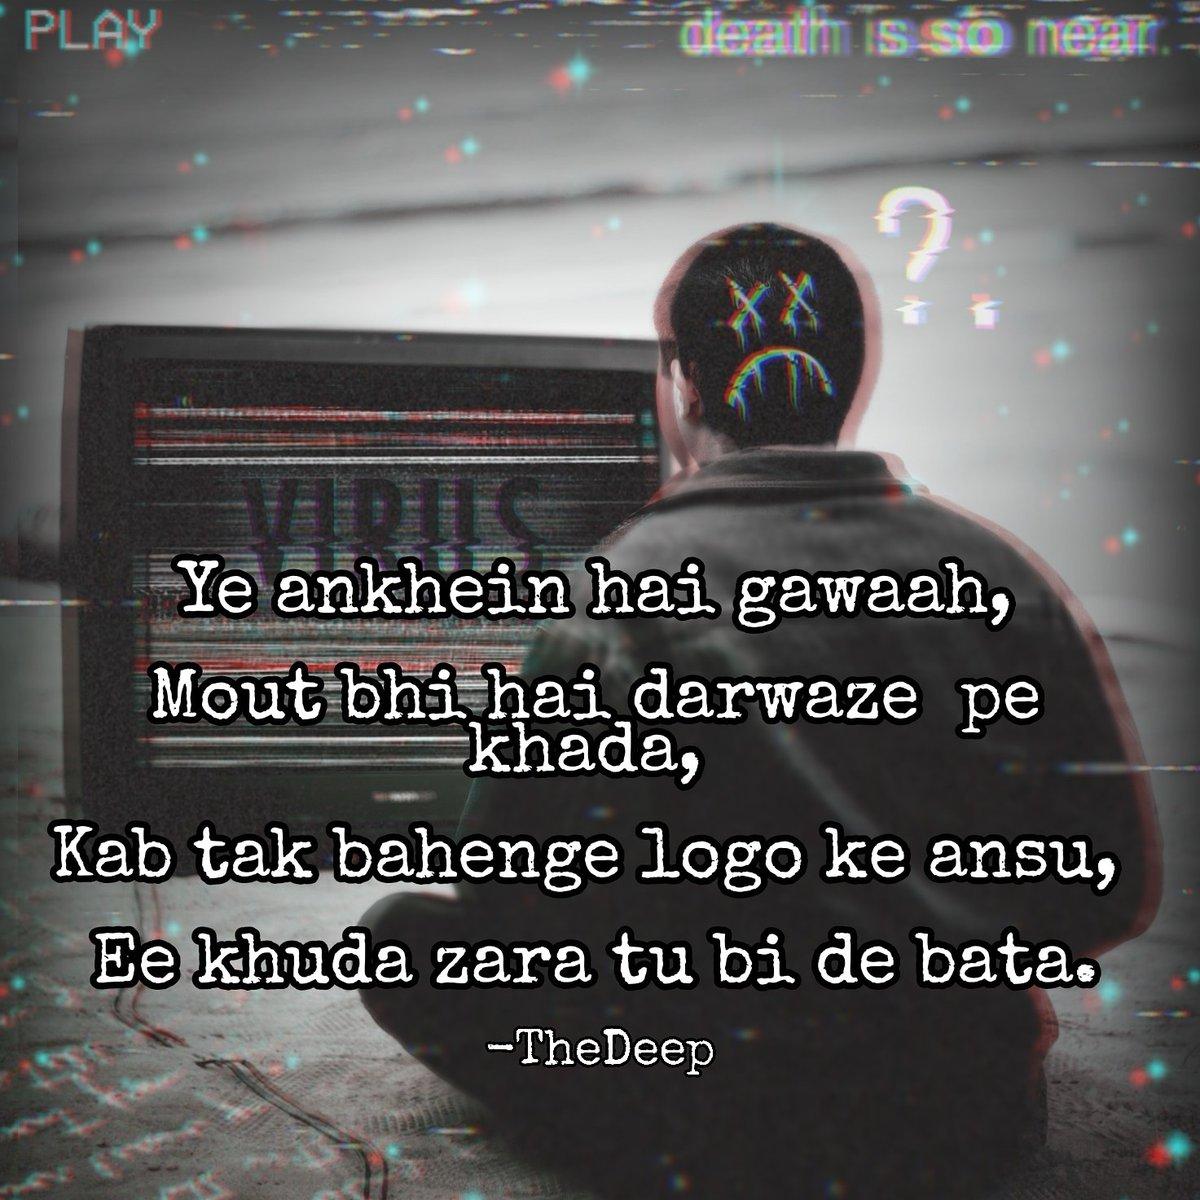 #CoronavirusOutbreak #LockdownWithoutPlan #IndiaFightsCorona #shayri #shayari #shayrilover #hindiquotes #sad  #shayar #quotes #shayrilove #sadshayri #follow #hindishayari #ishq  #writer #urdushayri #shayriquotes  #sadshayari #hindishayri #IndiaBattlesCoronavirus #bhfyppic.twitter.com/upxOf6ltFo